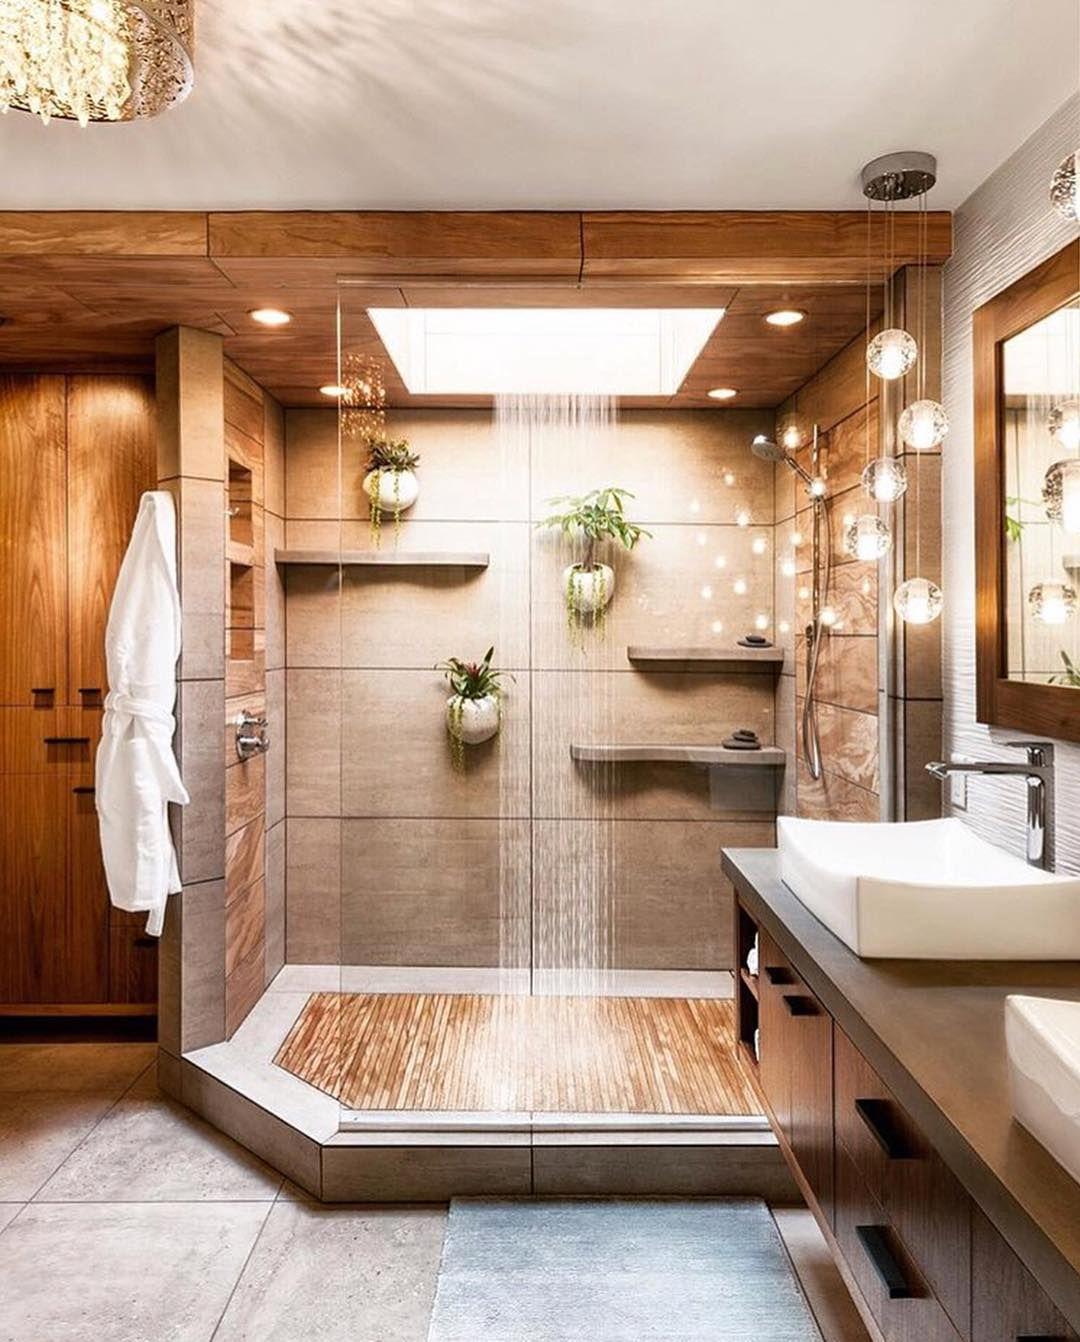 "İç Mimarlık Dergisi on Instagram: ""Amazing Shower by @mantisdesignbuild ----- #icmimarlikdergisi ----- #design #tasarım #içmimarlık #interior #architecture #furniture…"" #architecturallightingdesign"